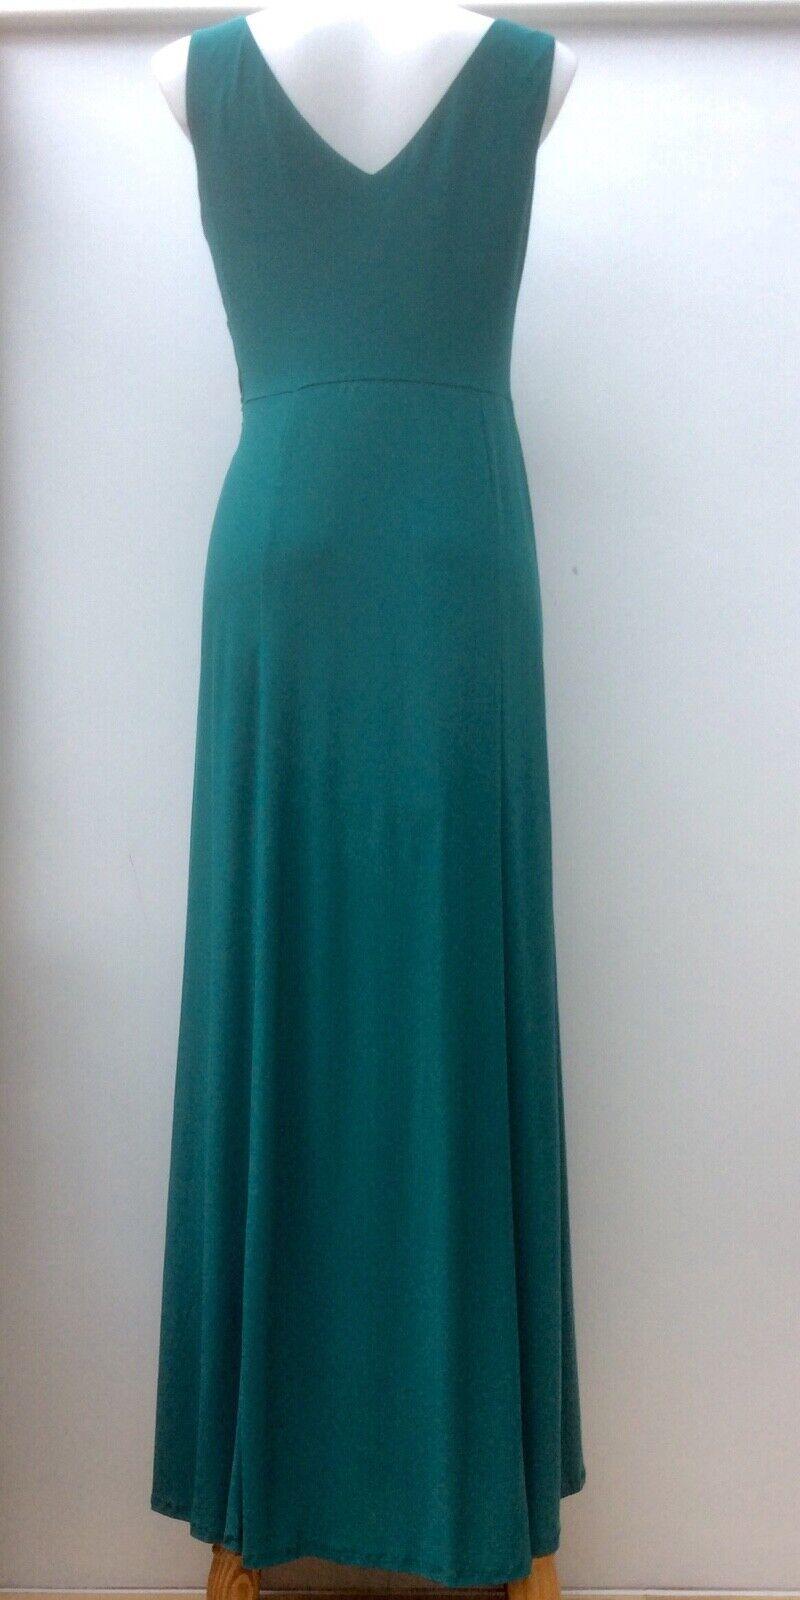 Kaliko Ladies Emerald Green Sleeveless Wrap Wrap Wrap Twisted Front Maxi Dress UK12 D 38 7e64fa